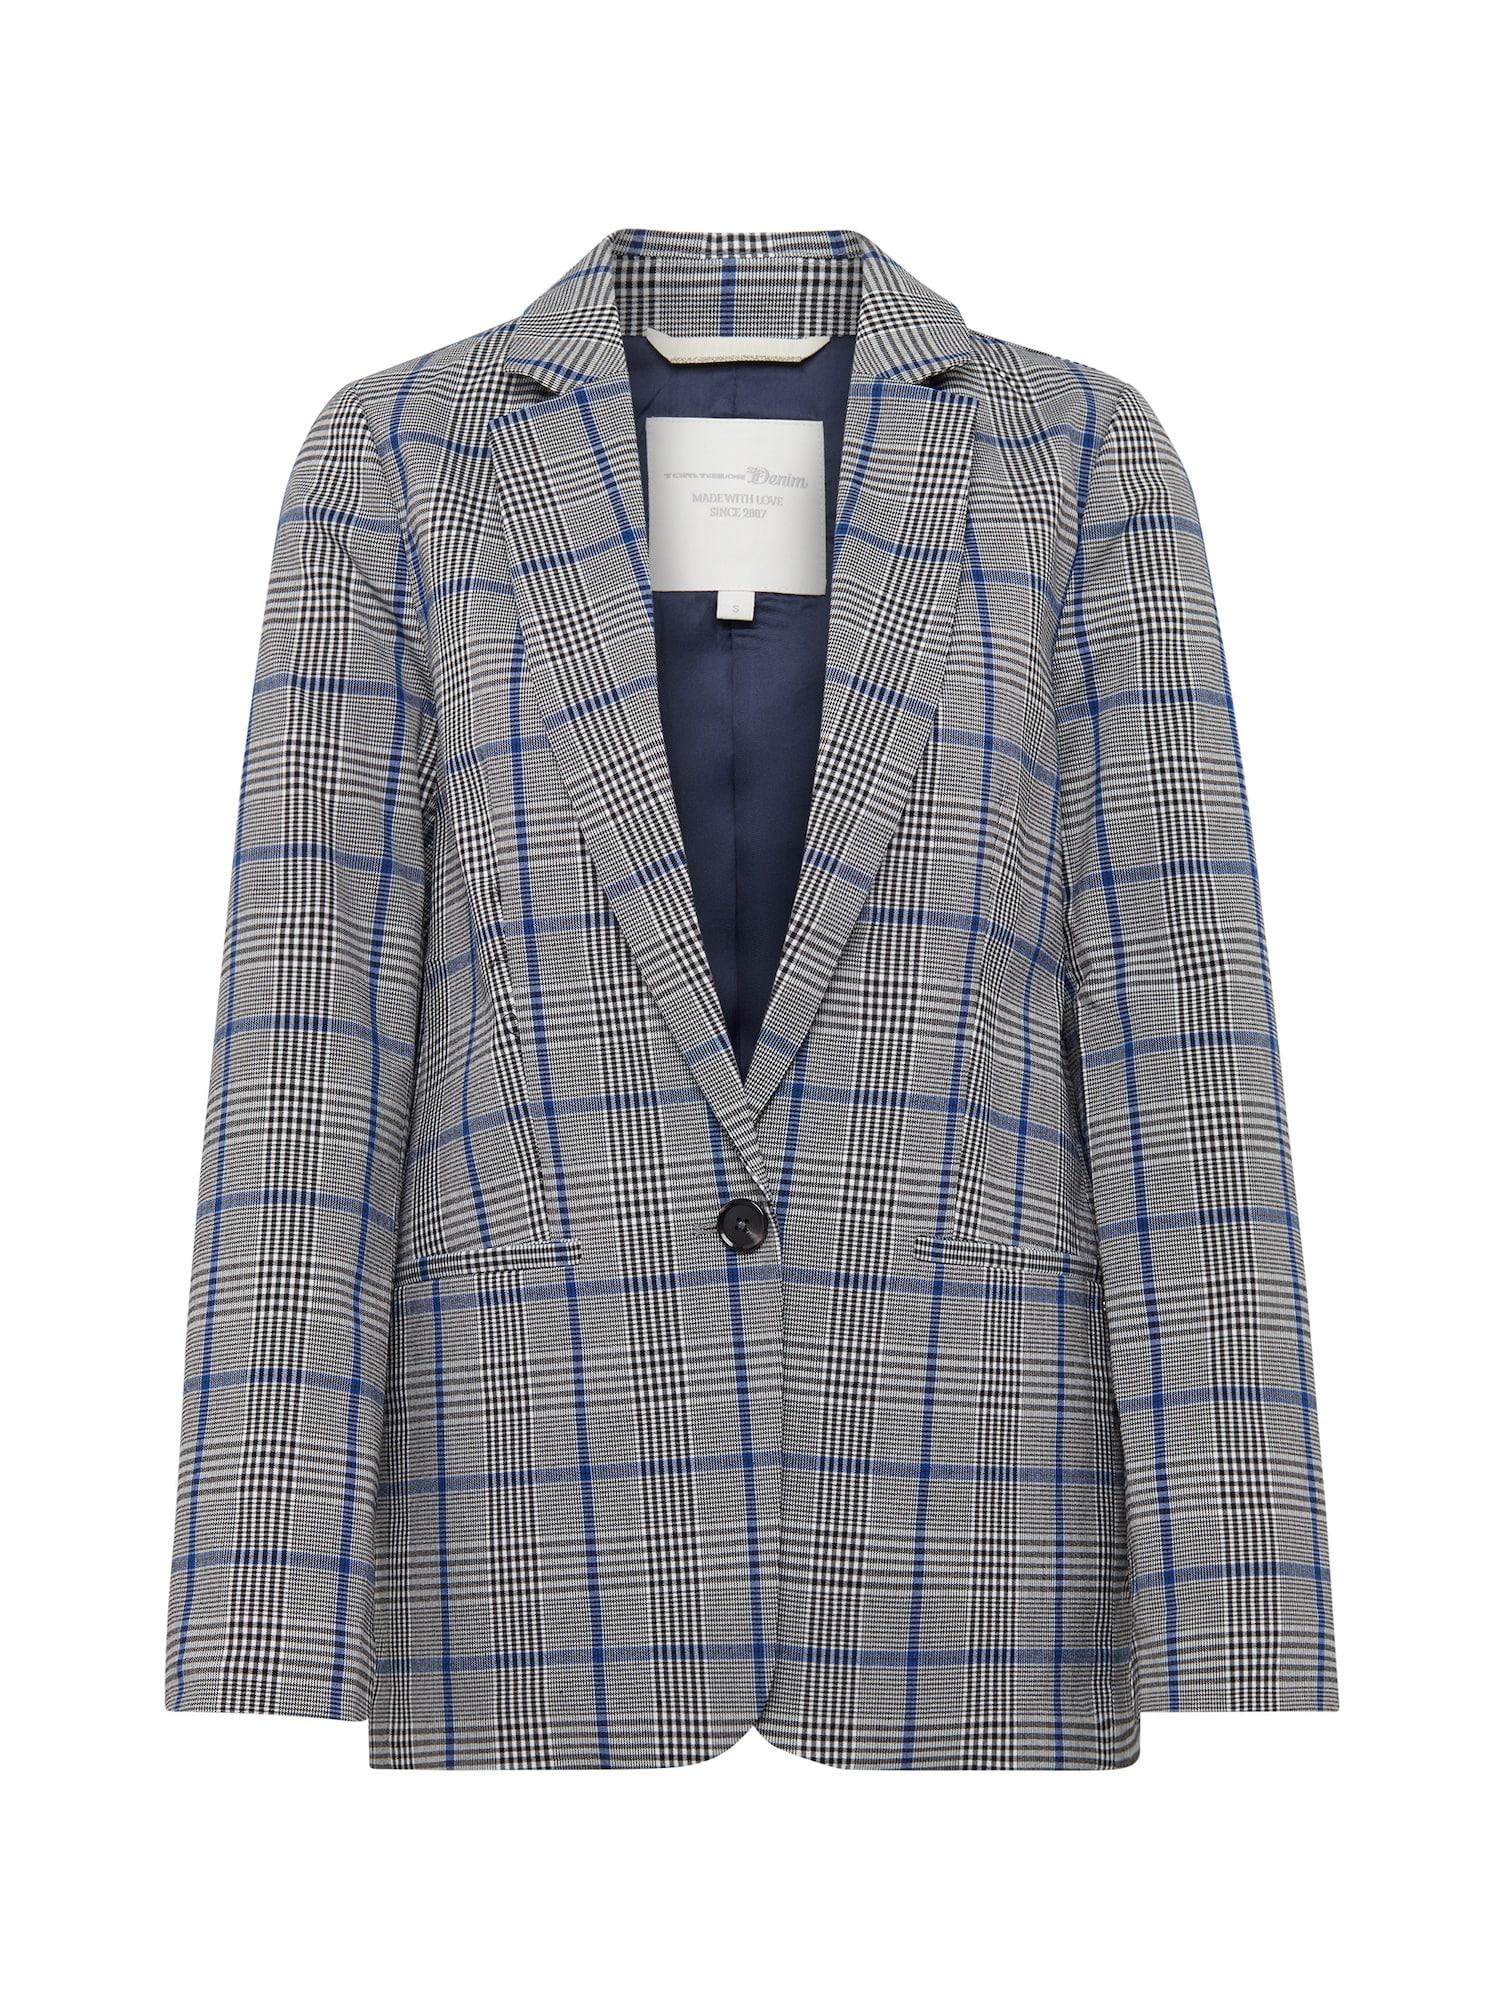 1b90b5e40c195a Grijze kleding online kopen